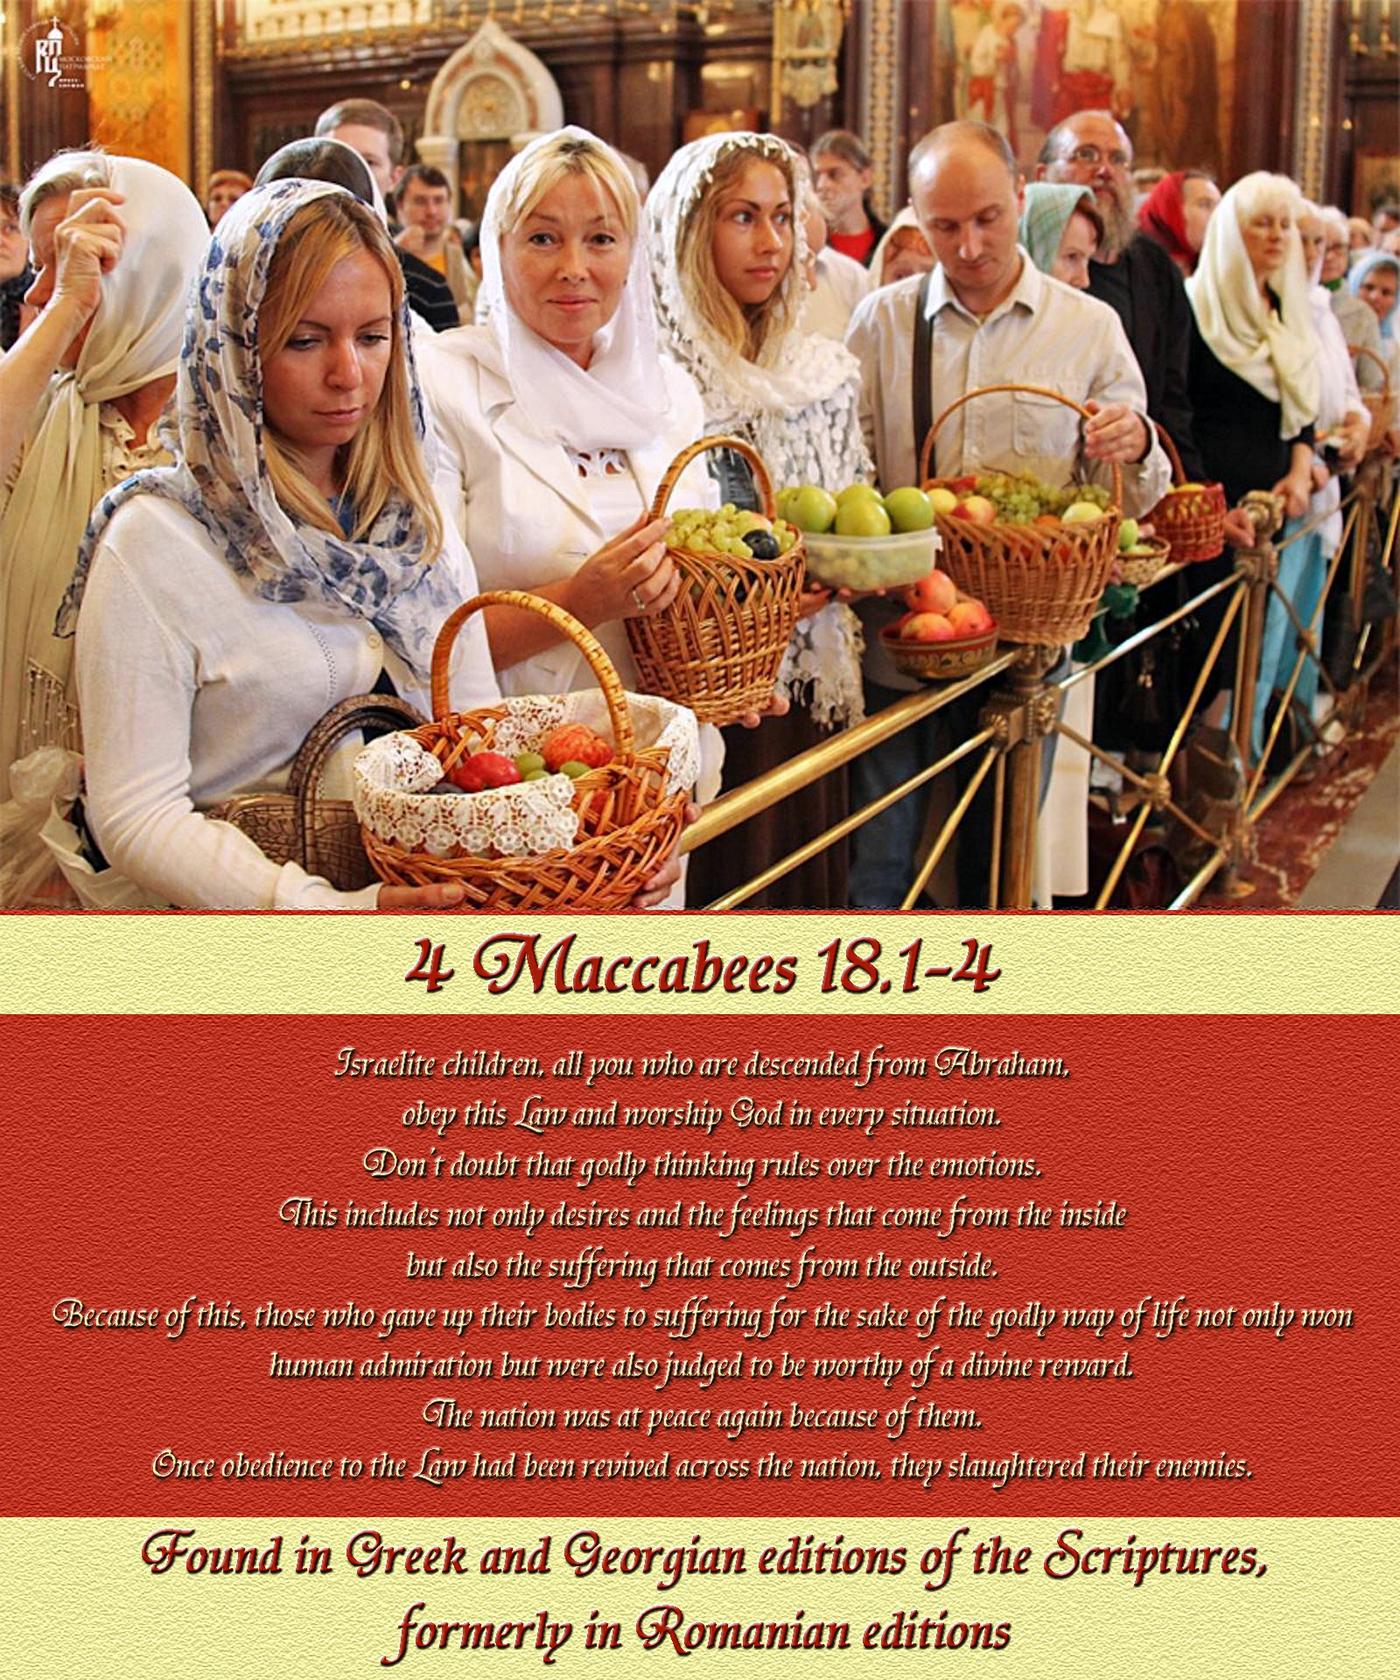 00 4 maccabees apple spas christ the saviour moscow 250815